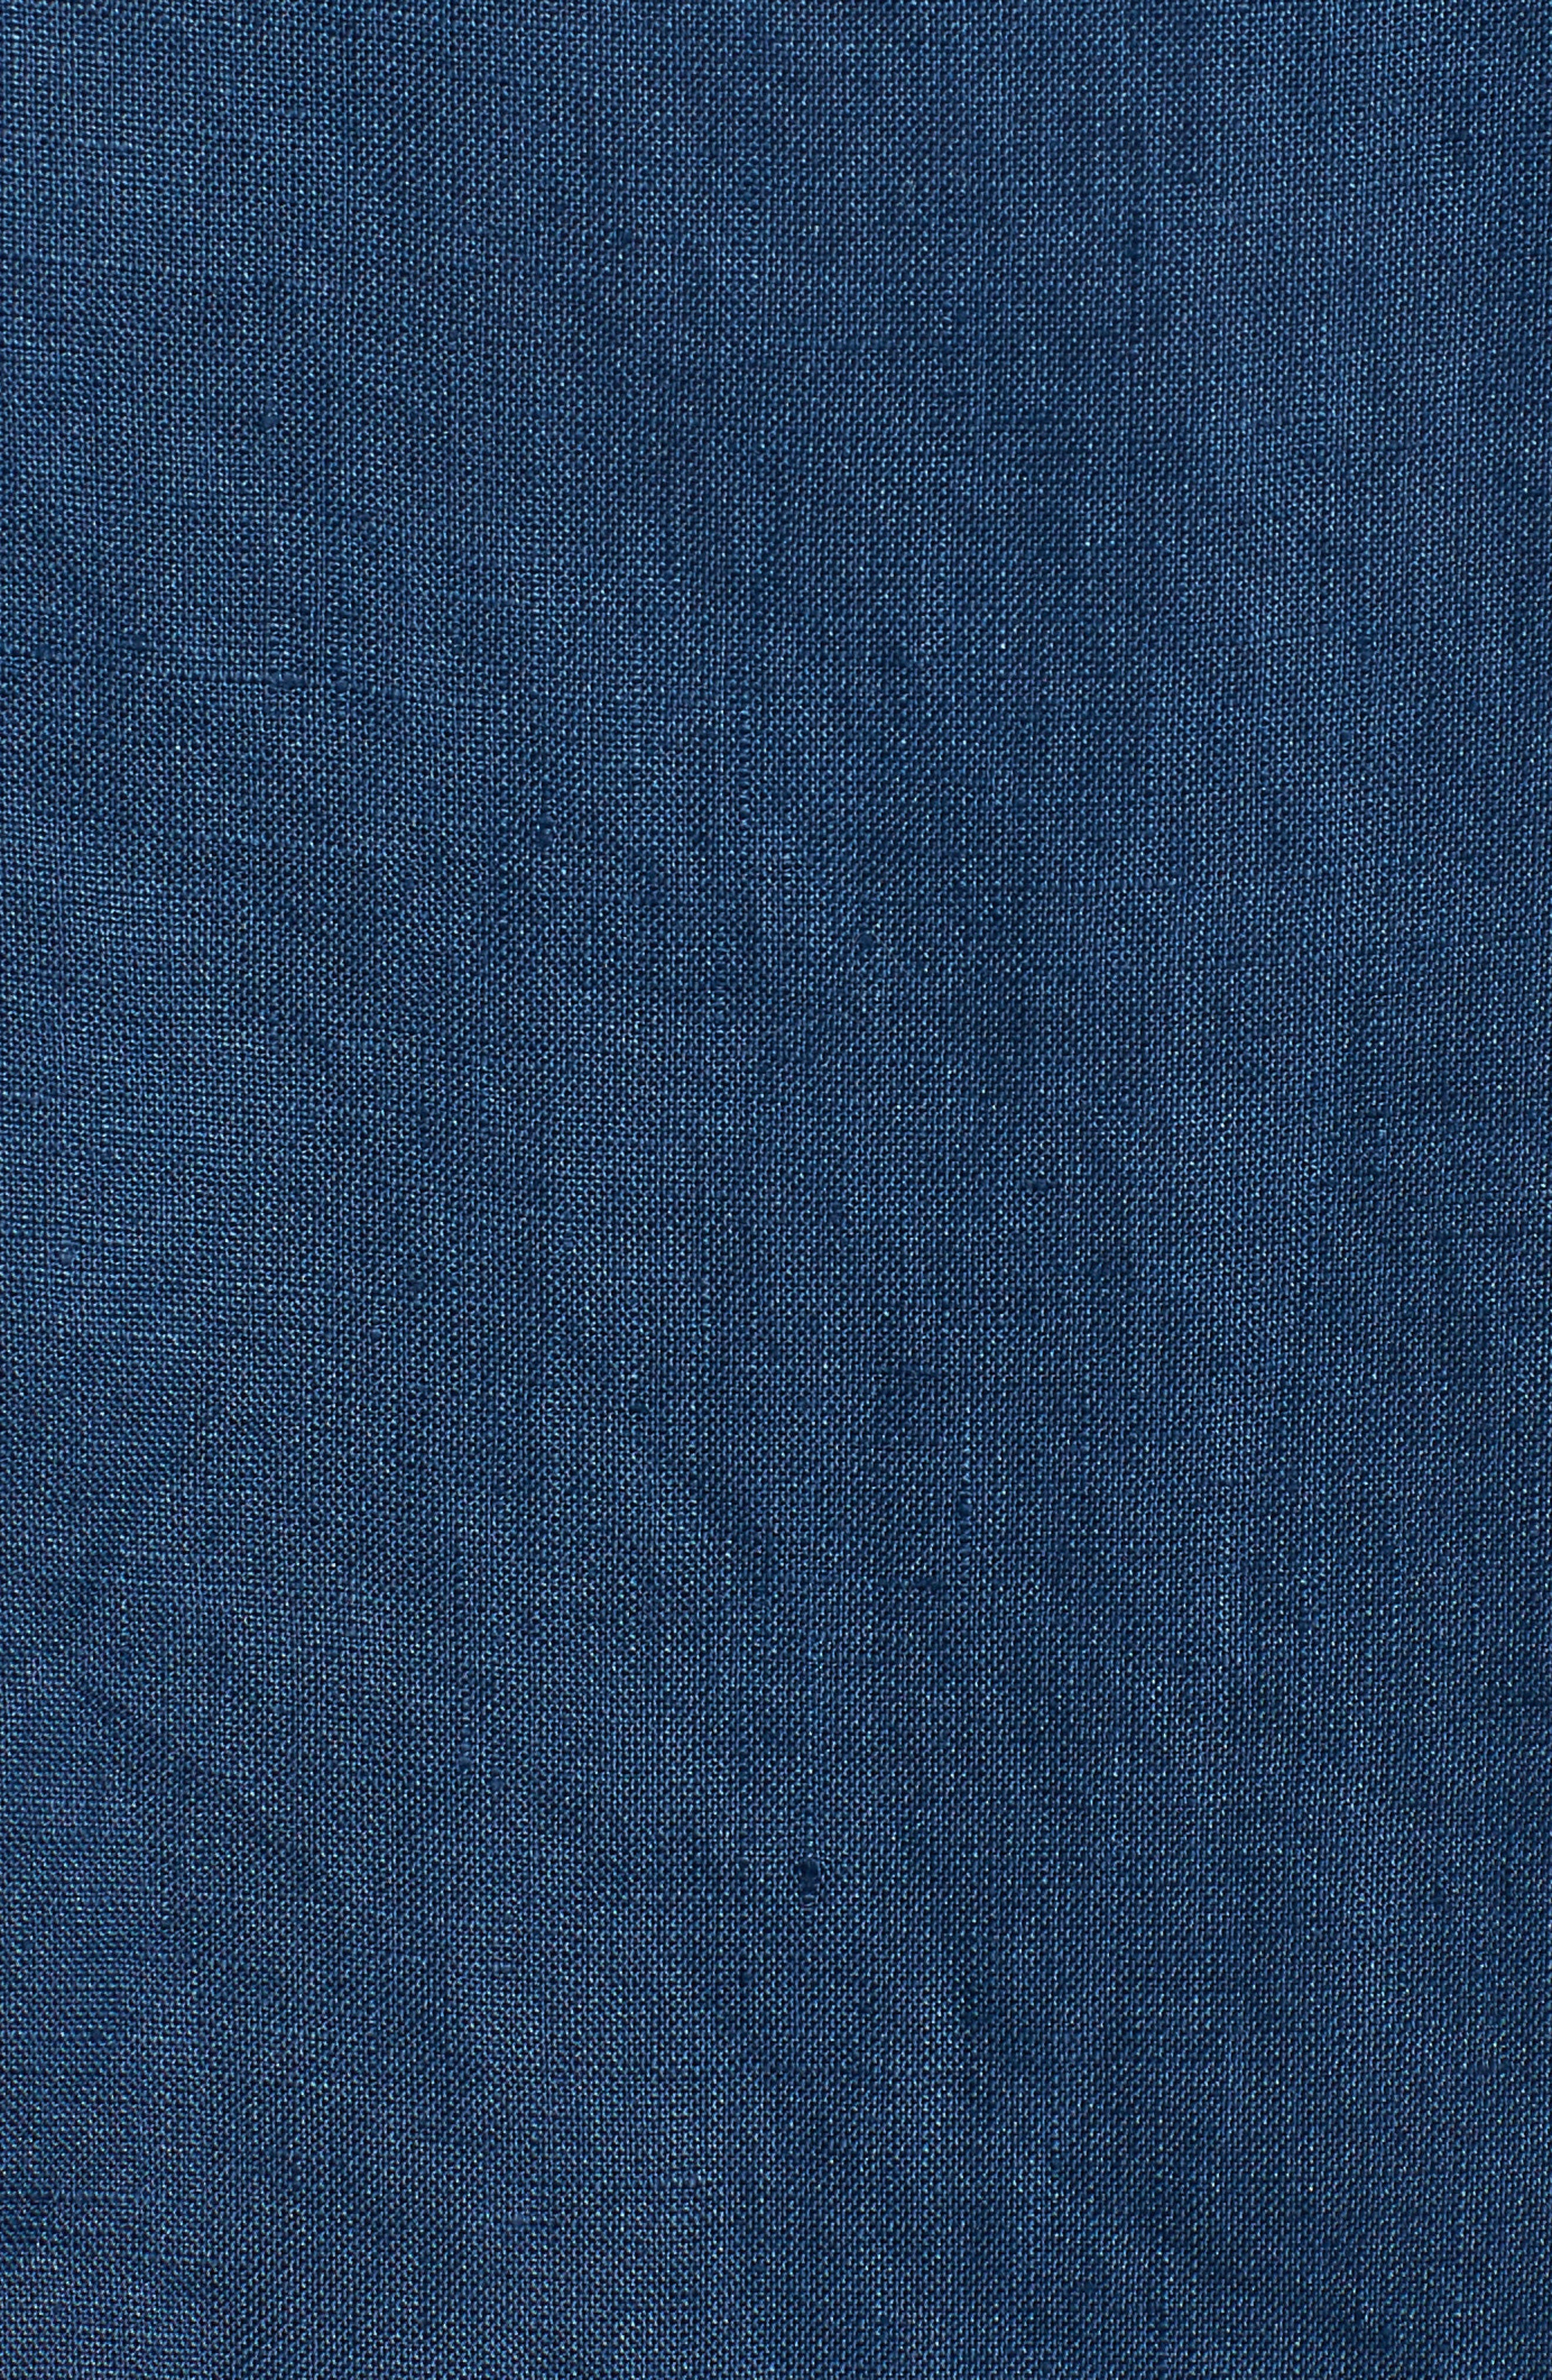 Woven Organic Linen Top,                             Alternate thumbnail 6, color,                             Denim